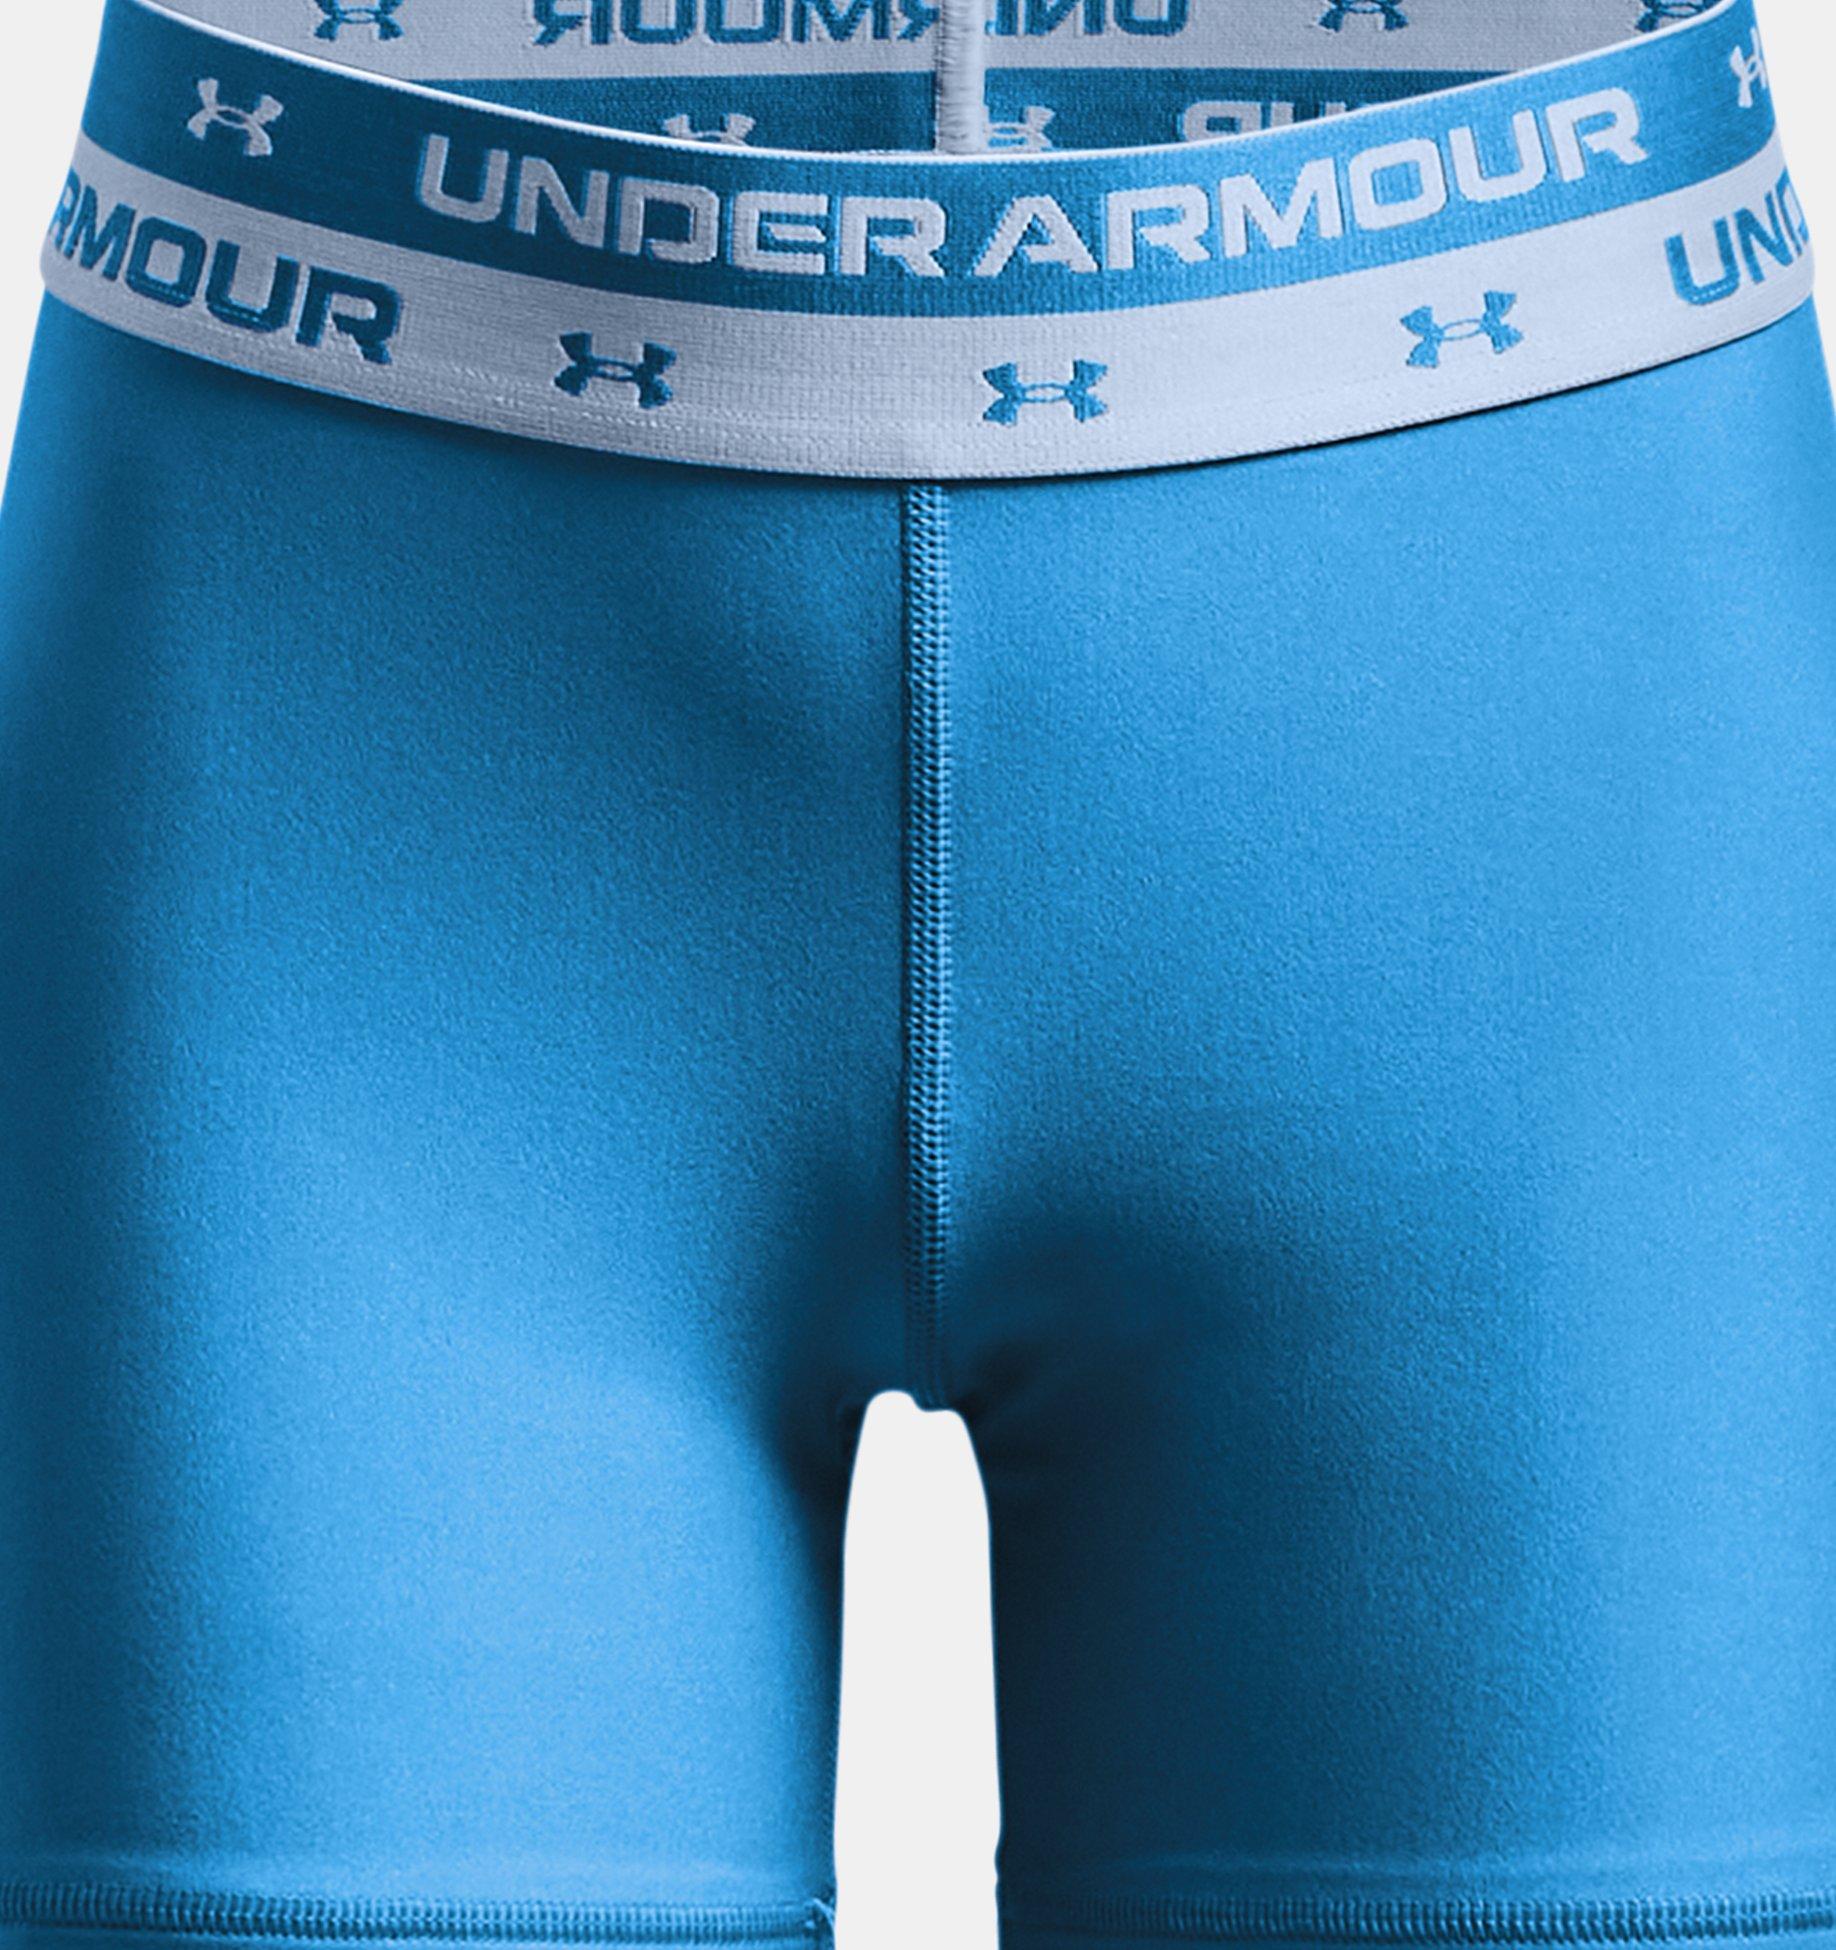 Underarmour Girls HeatGear Armour Middy Shorts